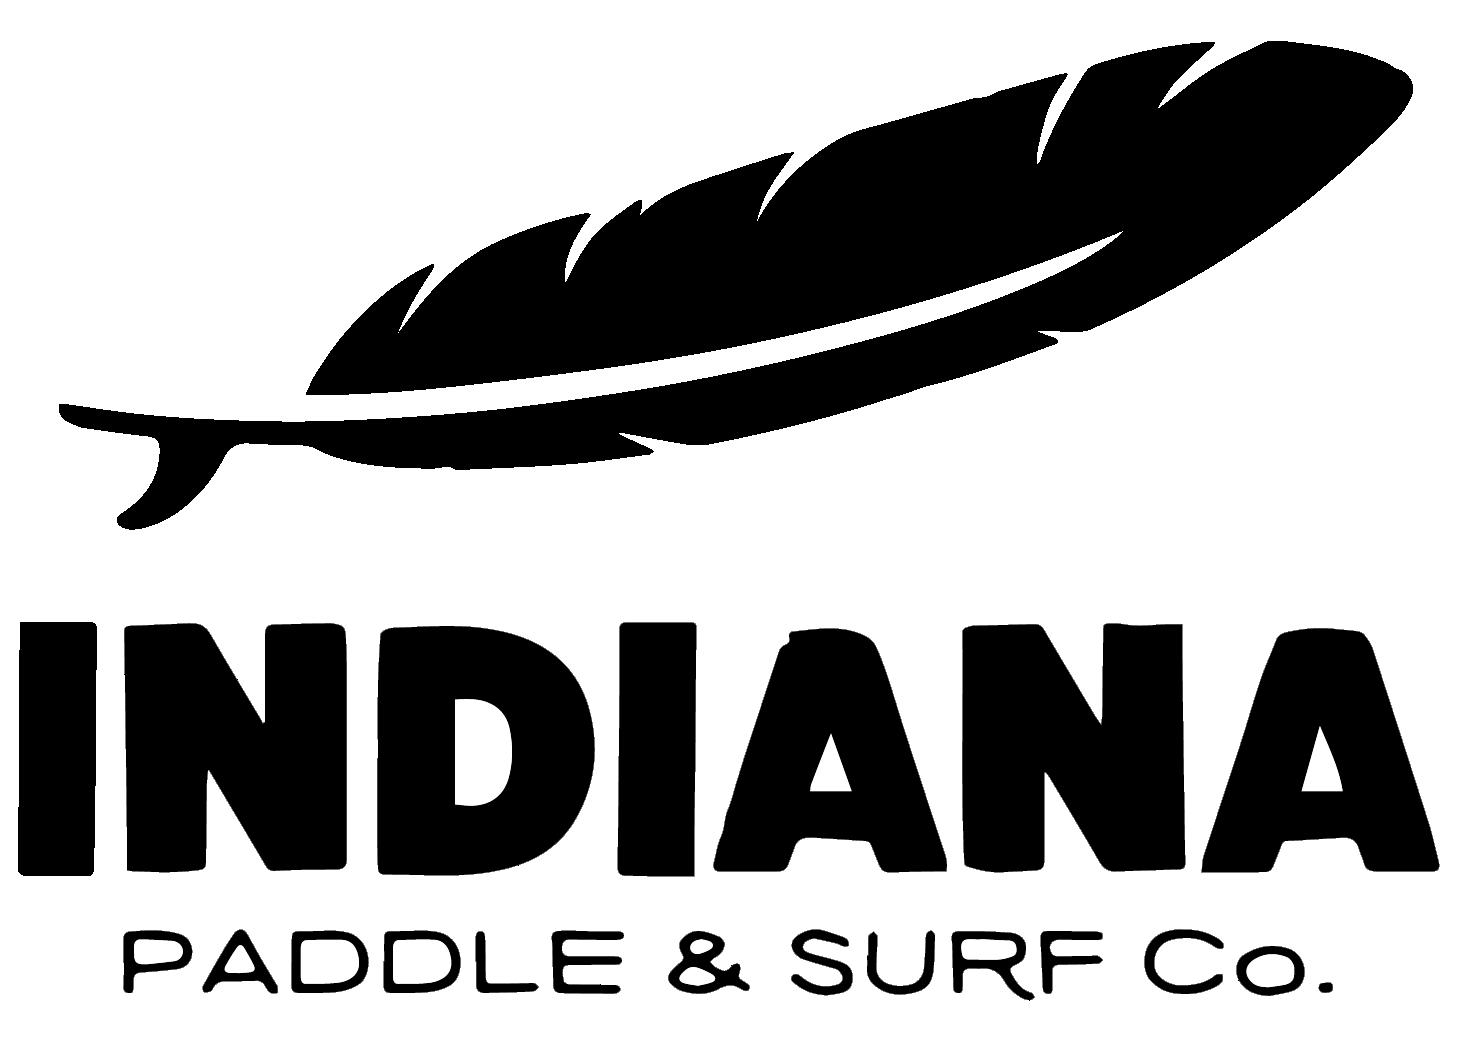 Indiana, Logo/Brand | matadorworld.innsbruck